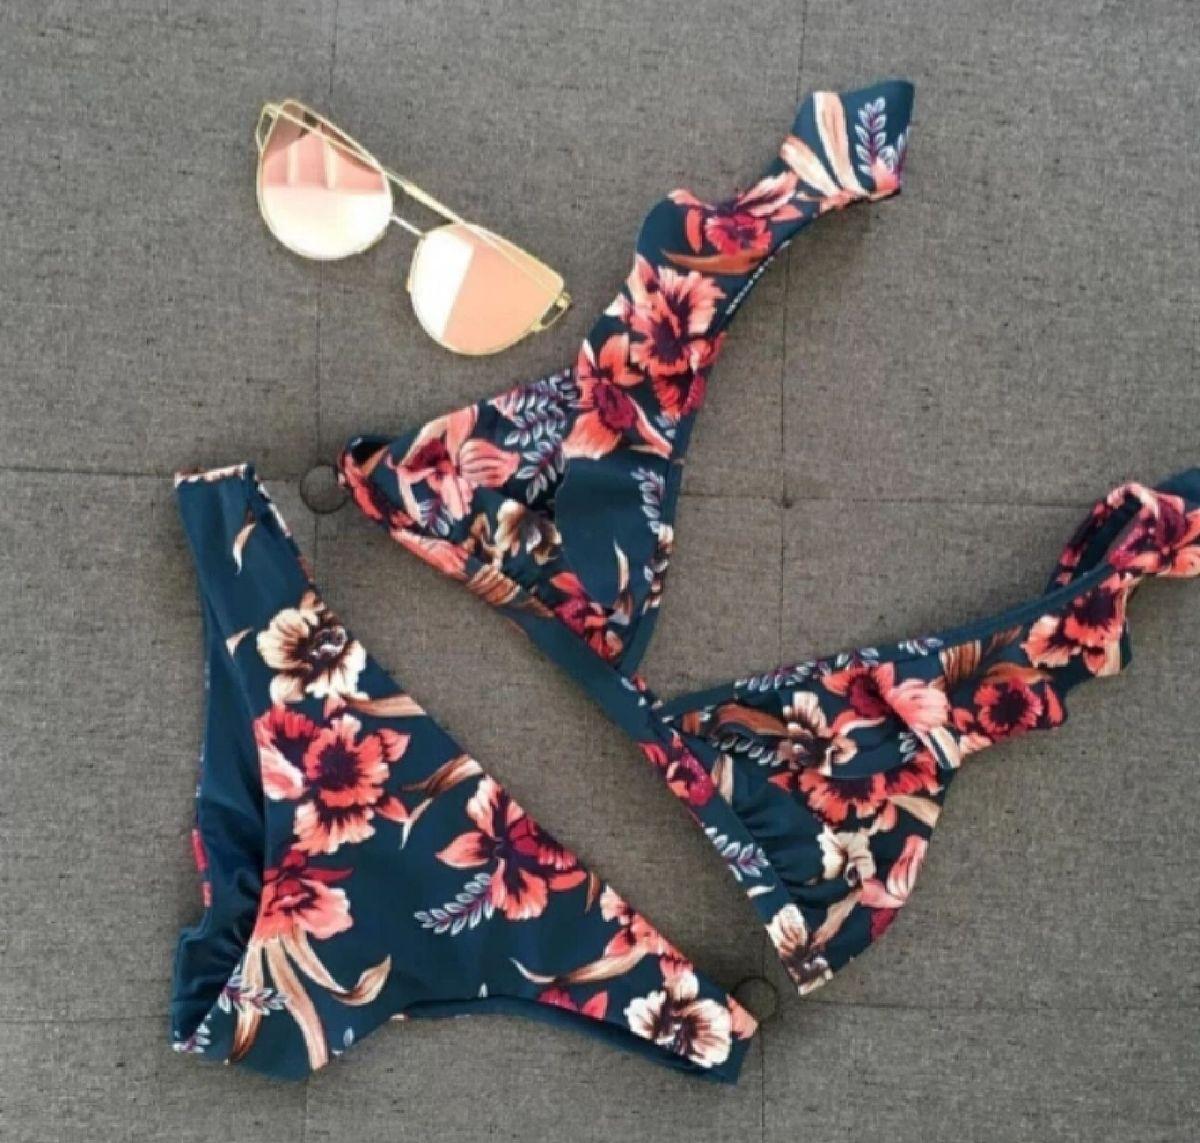 biquini floral com bojo - praia sem marca